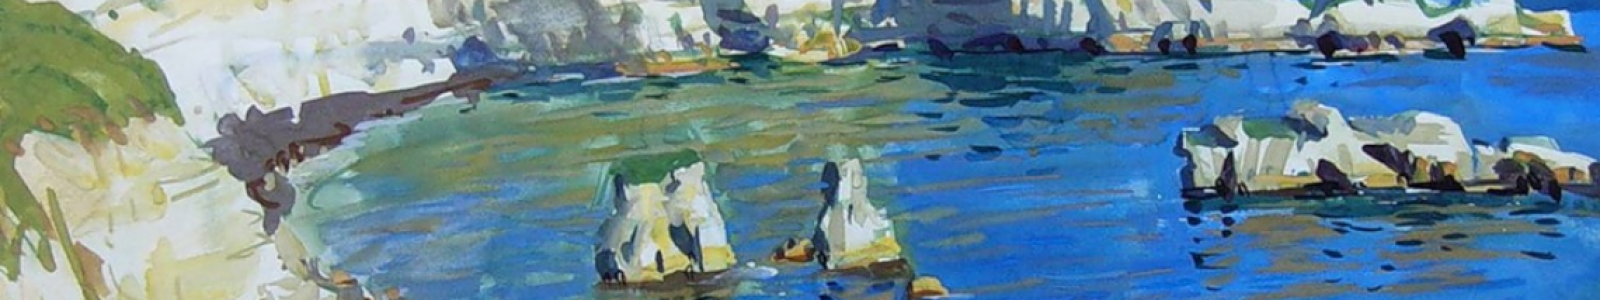 Galerie Bildmaler Vladimir Olhov